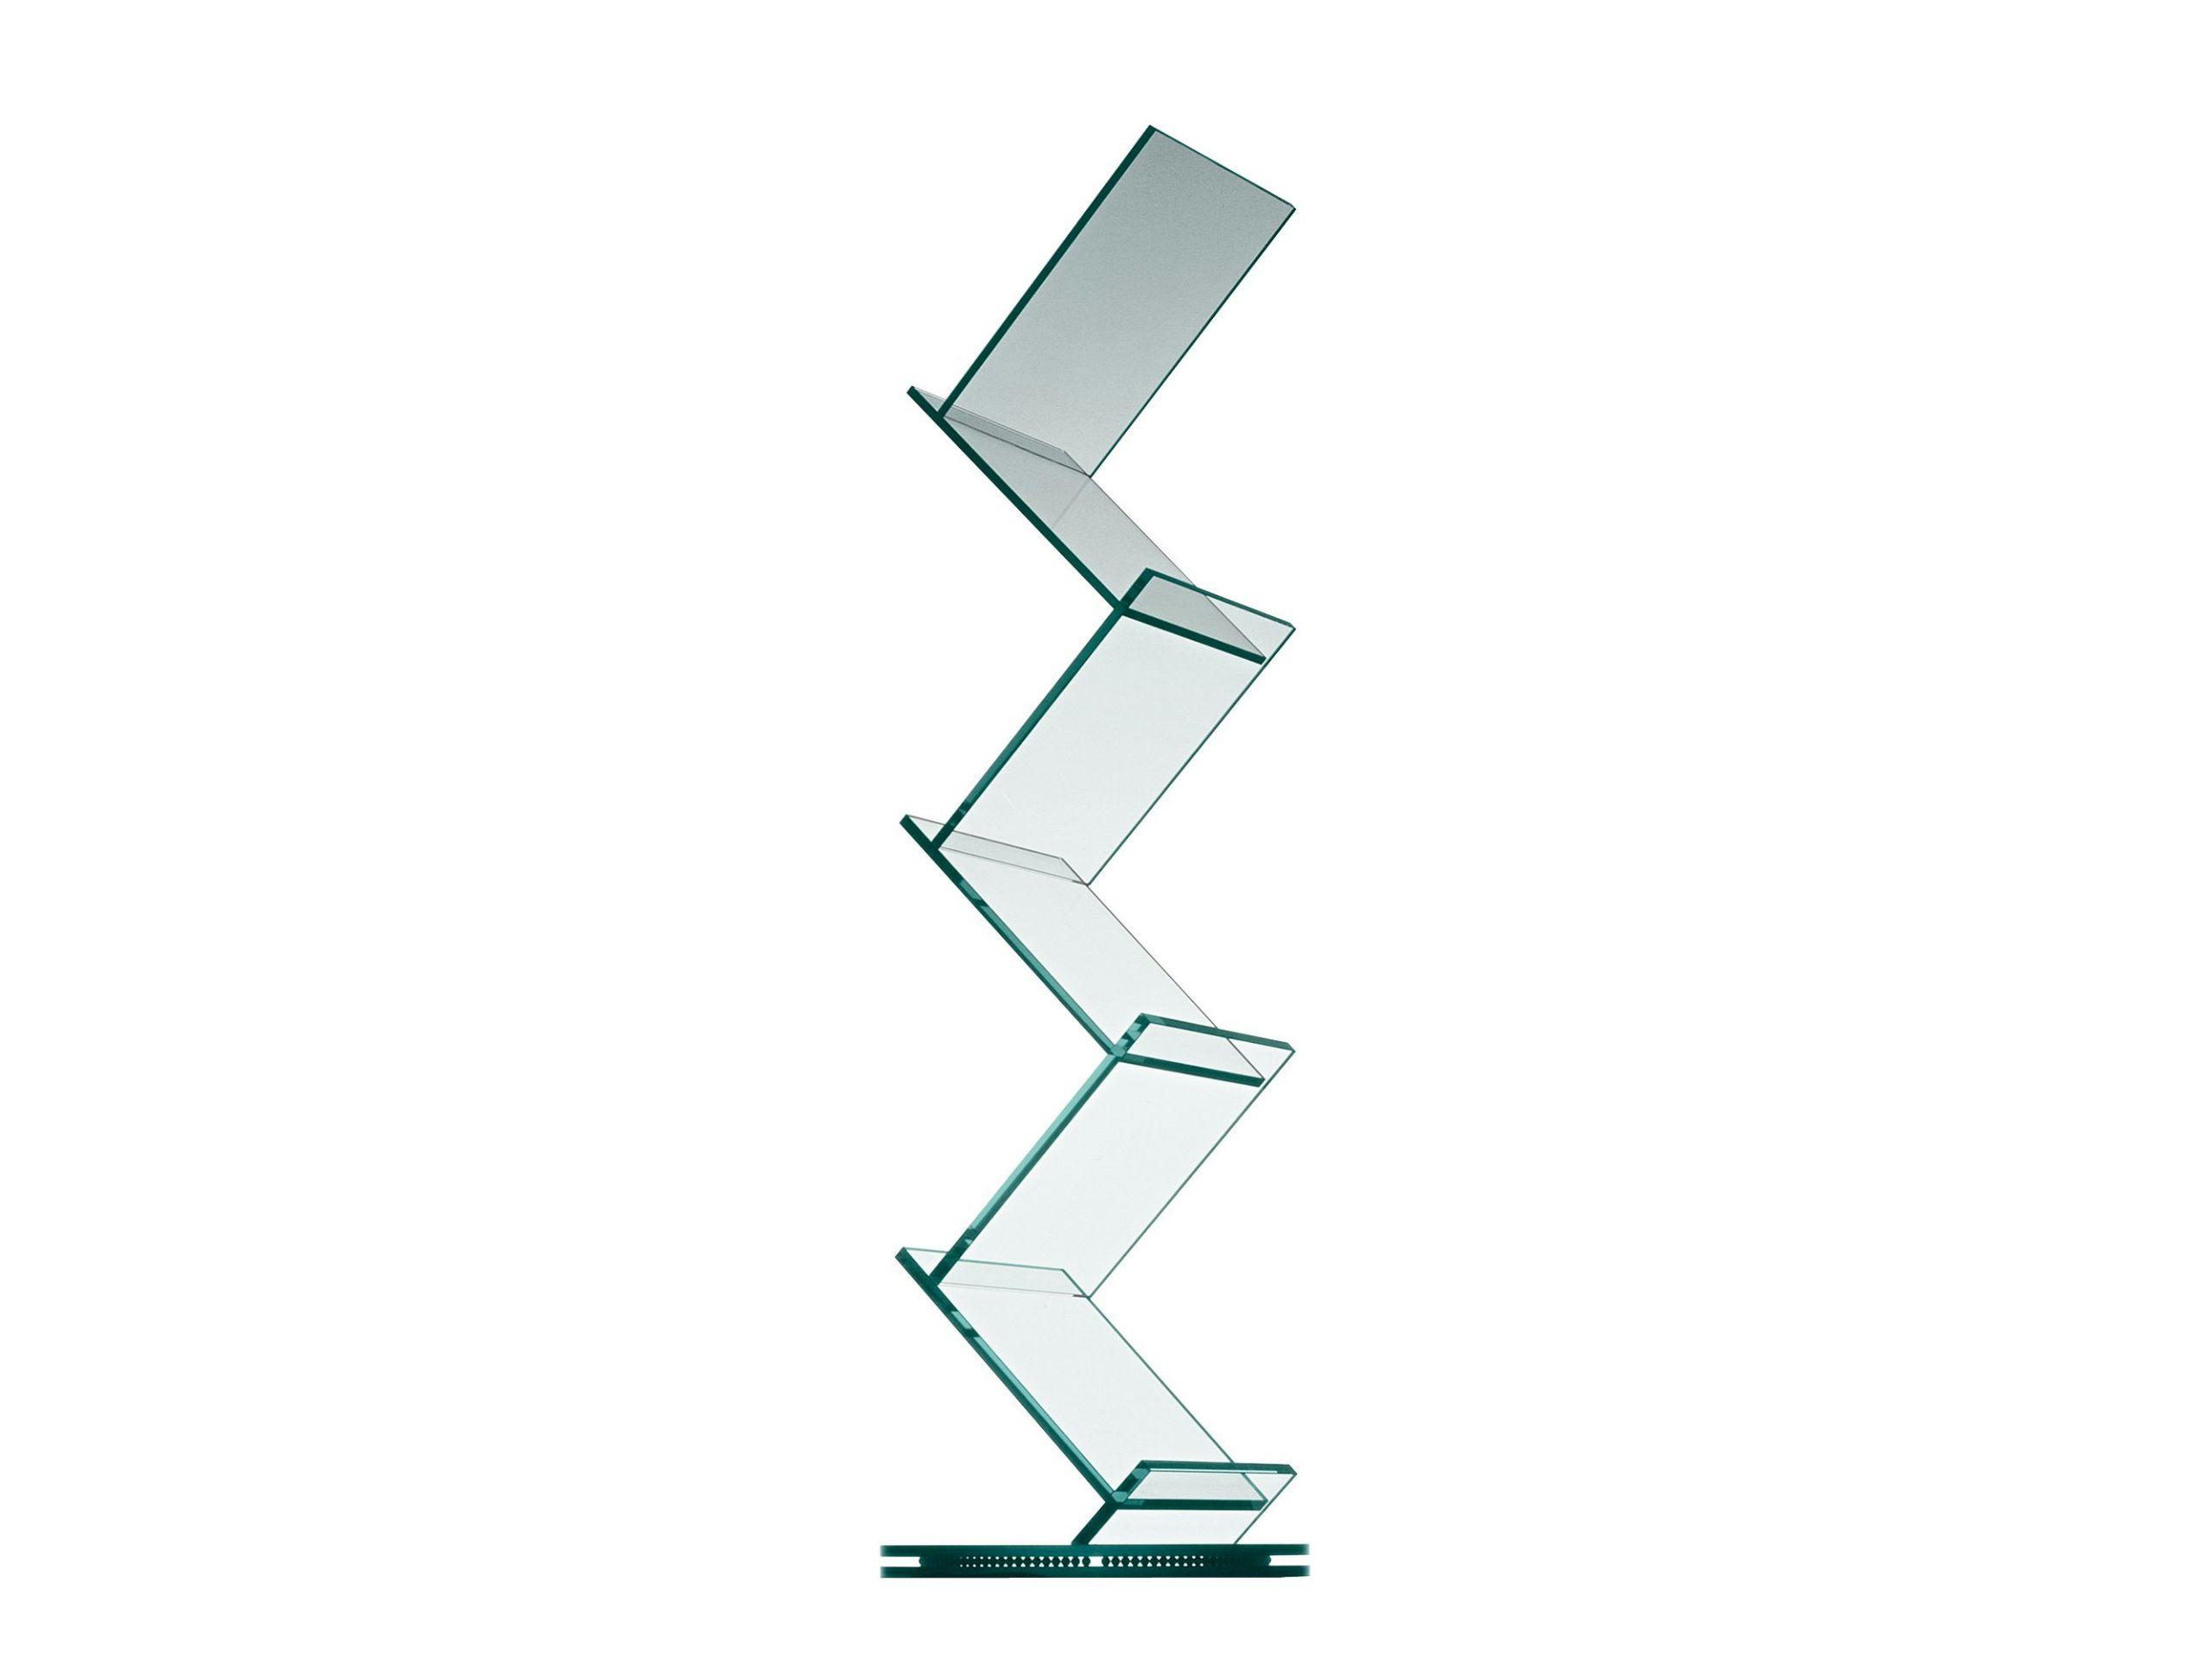 drehbares b cherregal aus glas albero by td tonelli. Black Bedroom Furniture Sets. Home Design Ideas